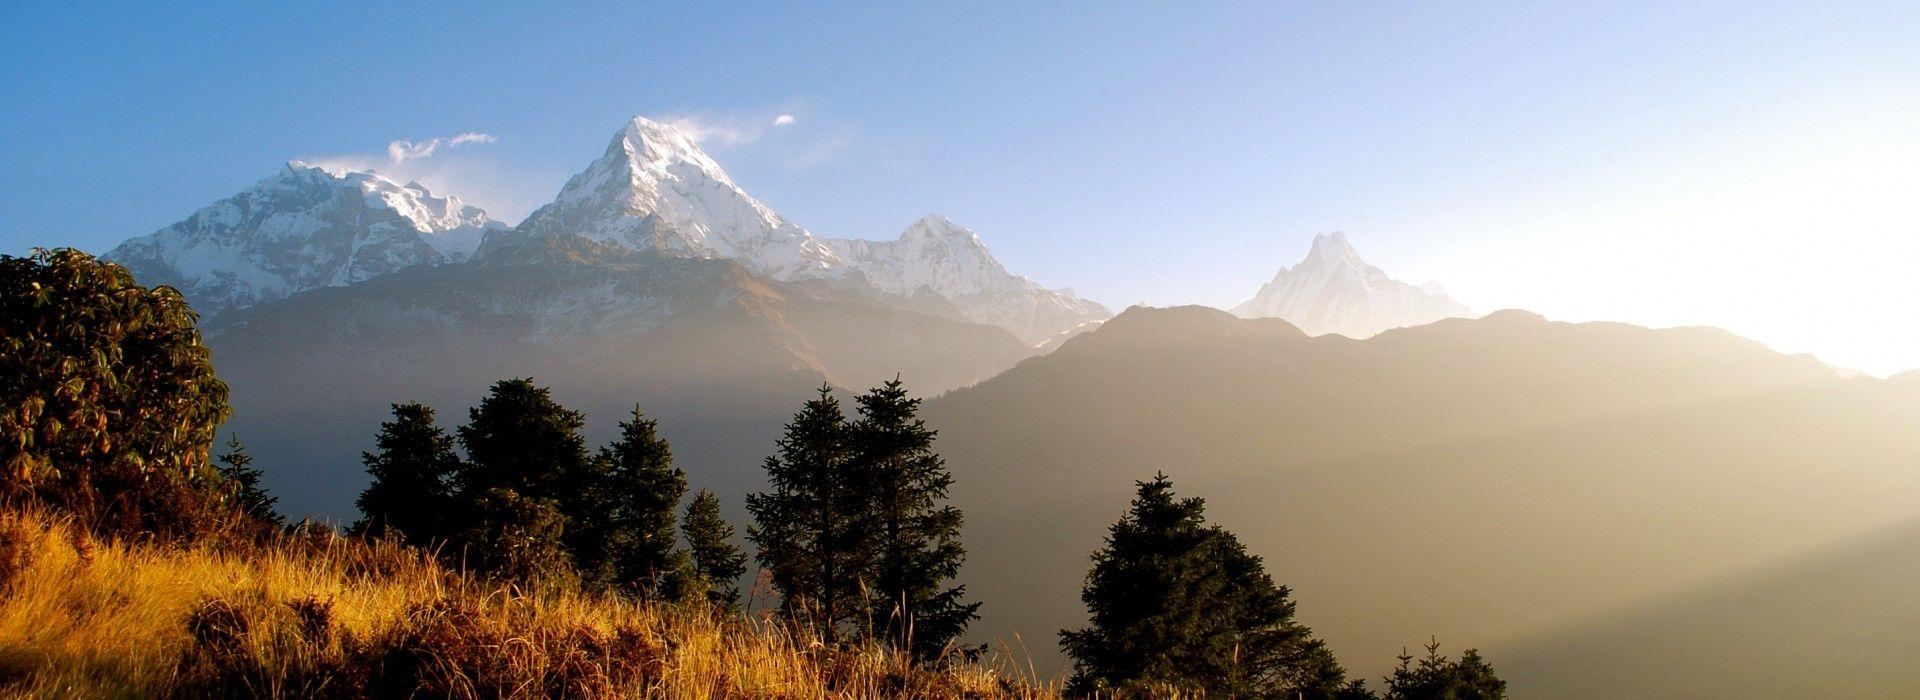 Adventure and sport activities Tours in Everest Base Camp trek